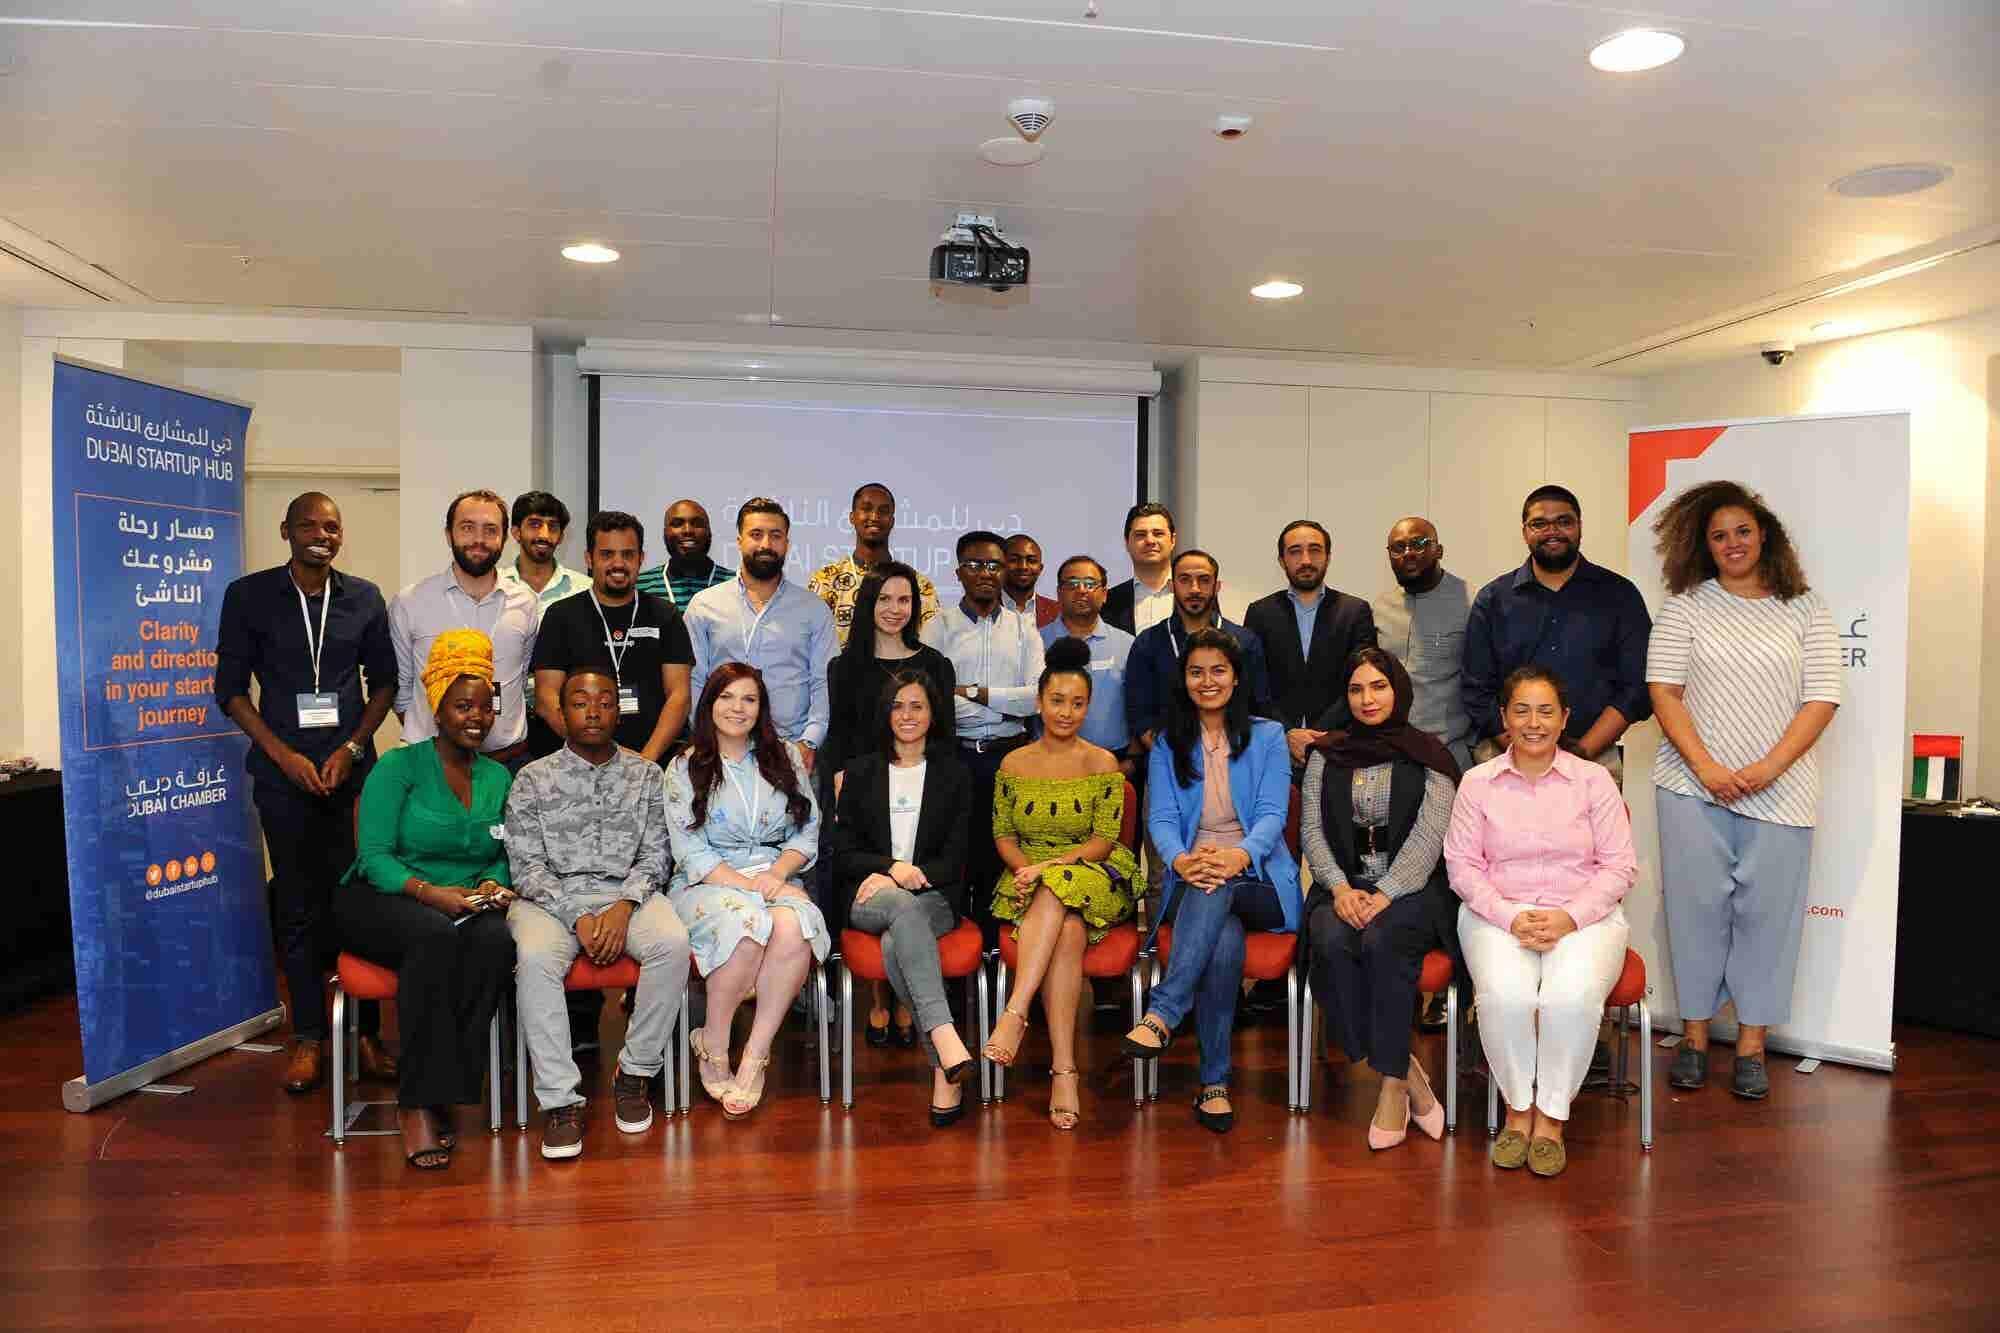 Dubai Chamber's Chamberthon In Rwanda Pairs Entrepreneurs From The UAE And Africa To Build A Cross-Border Mentorship Program